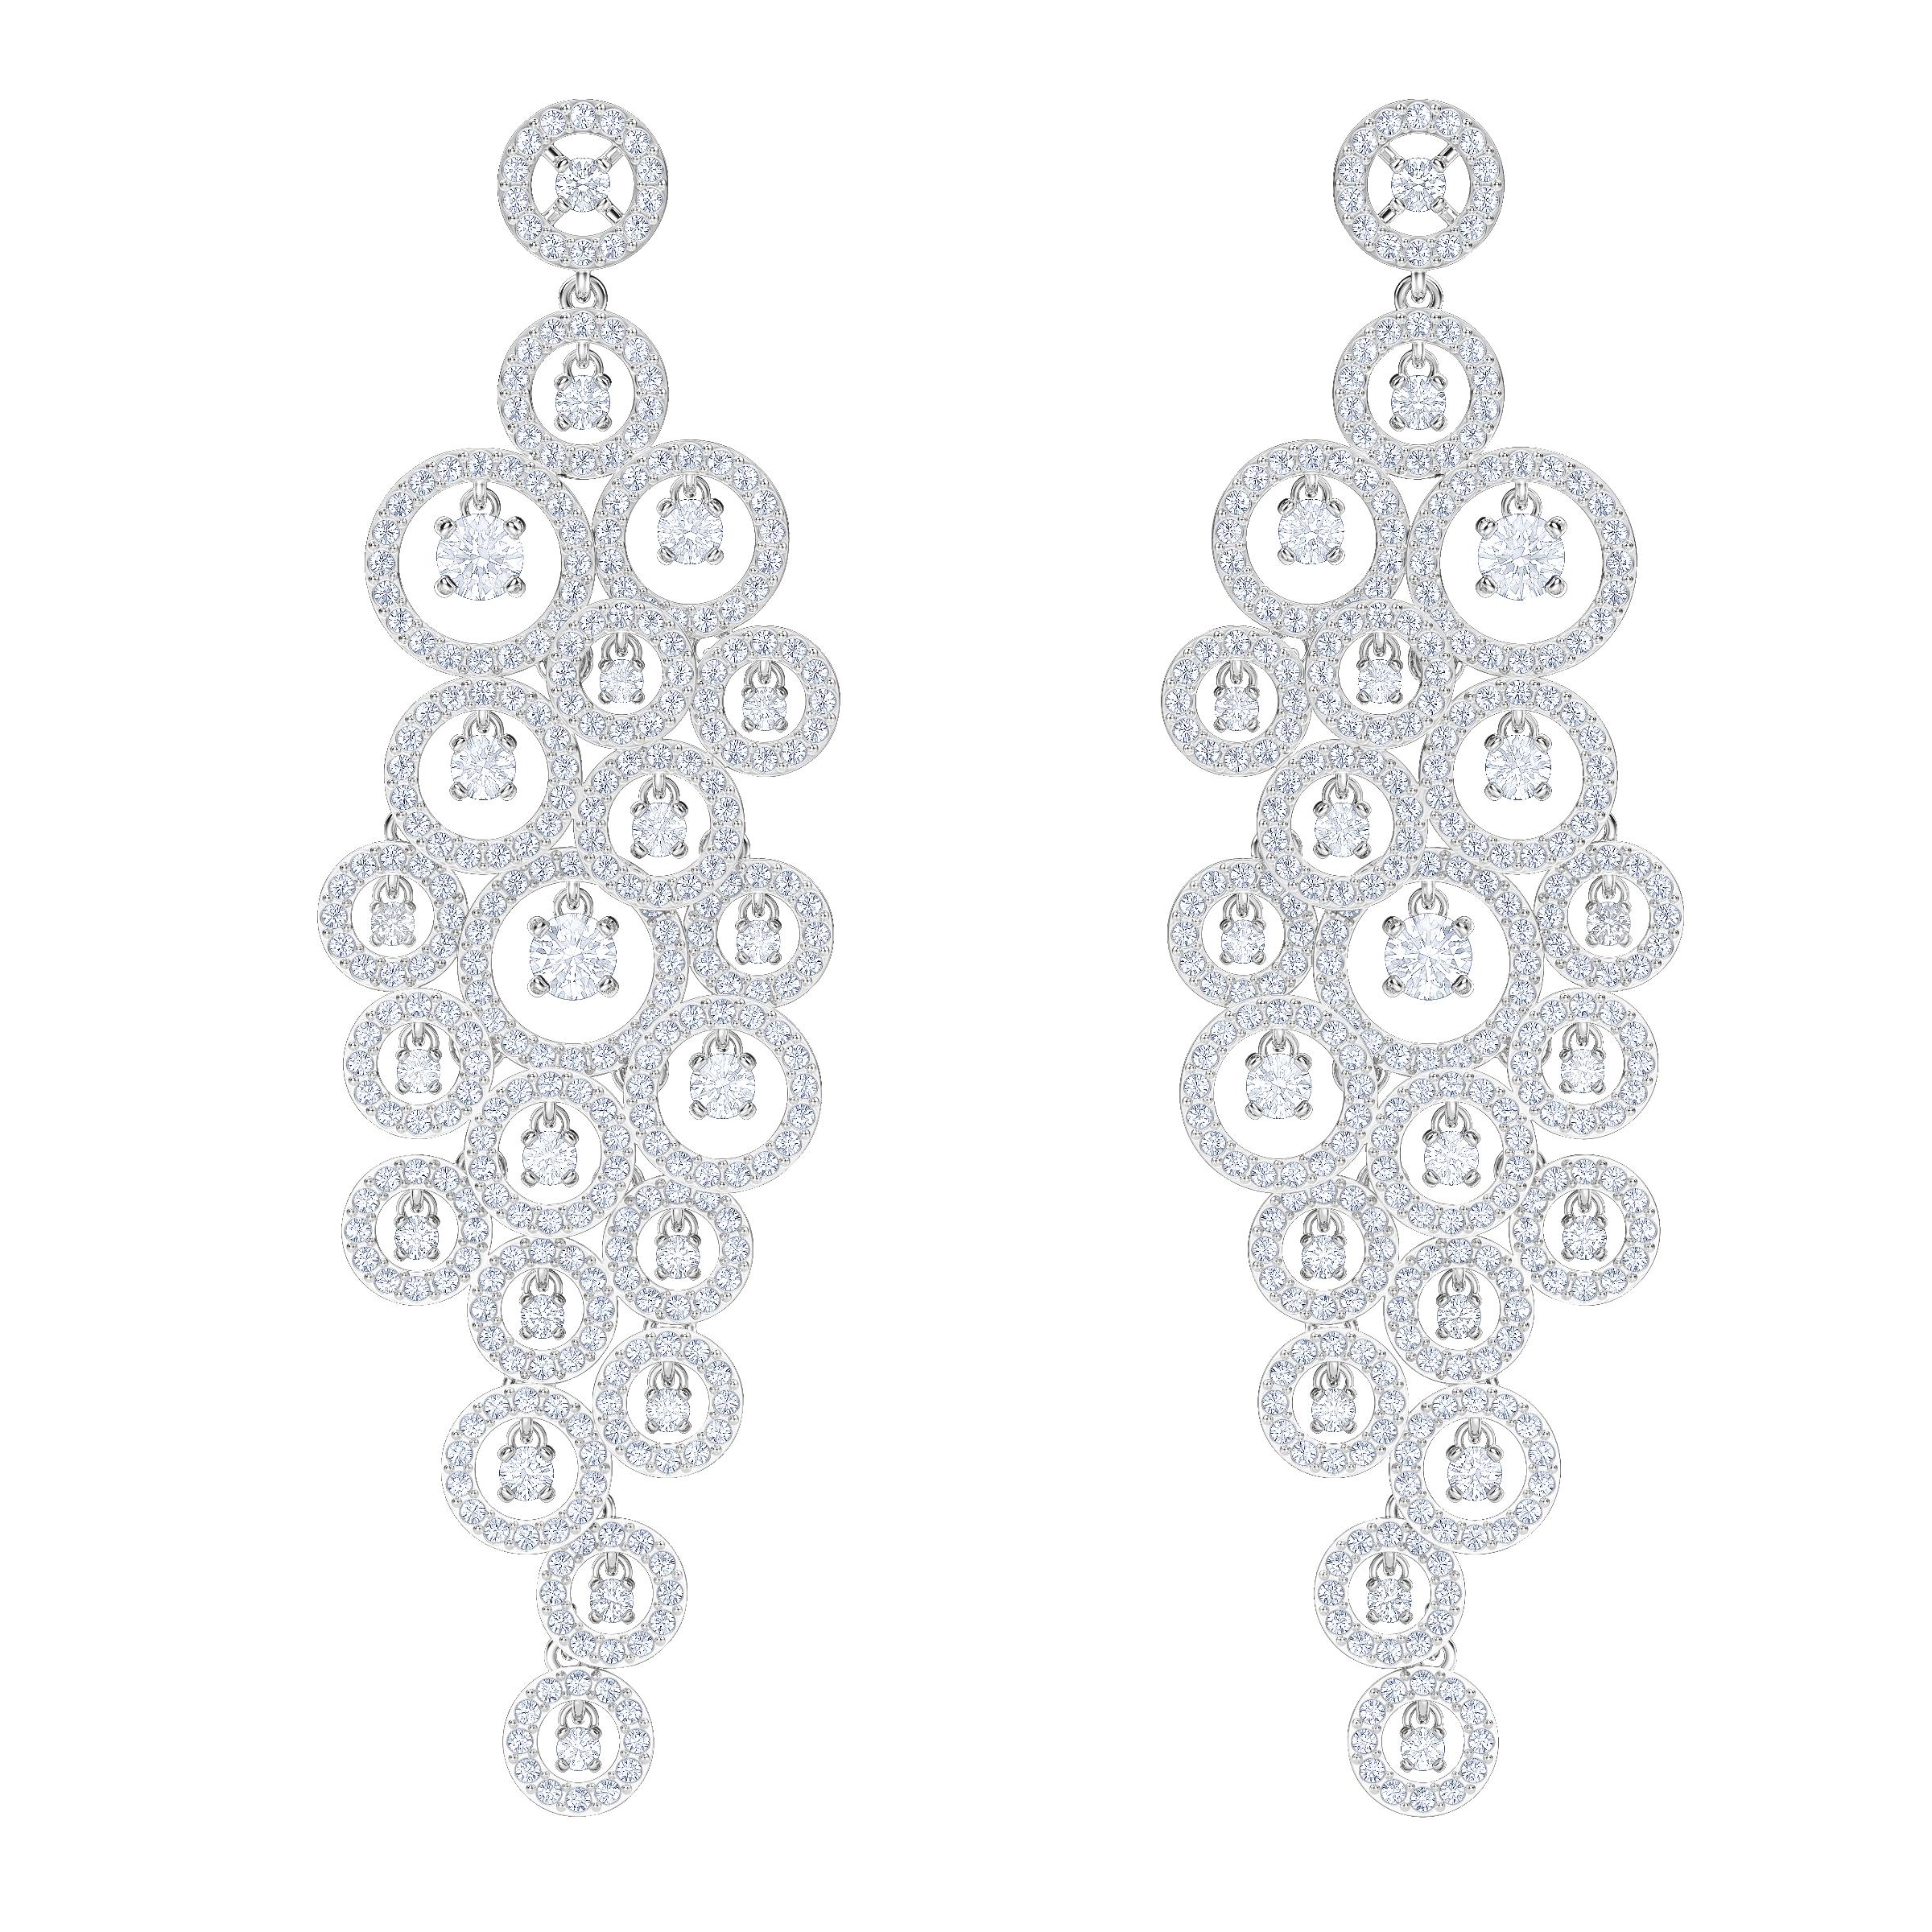 Creativity Chandelier Pierced Earrings, White, Rhodium Plating